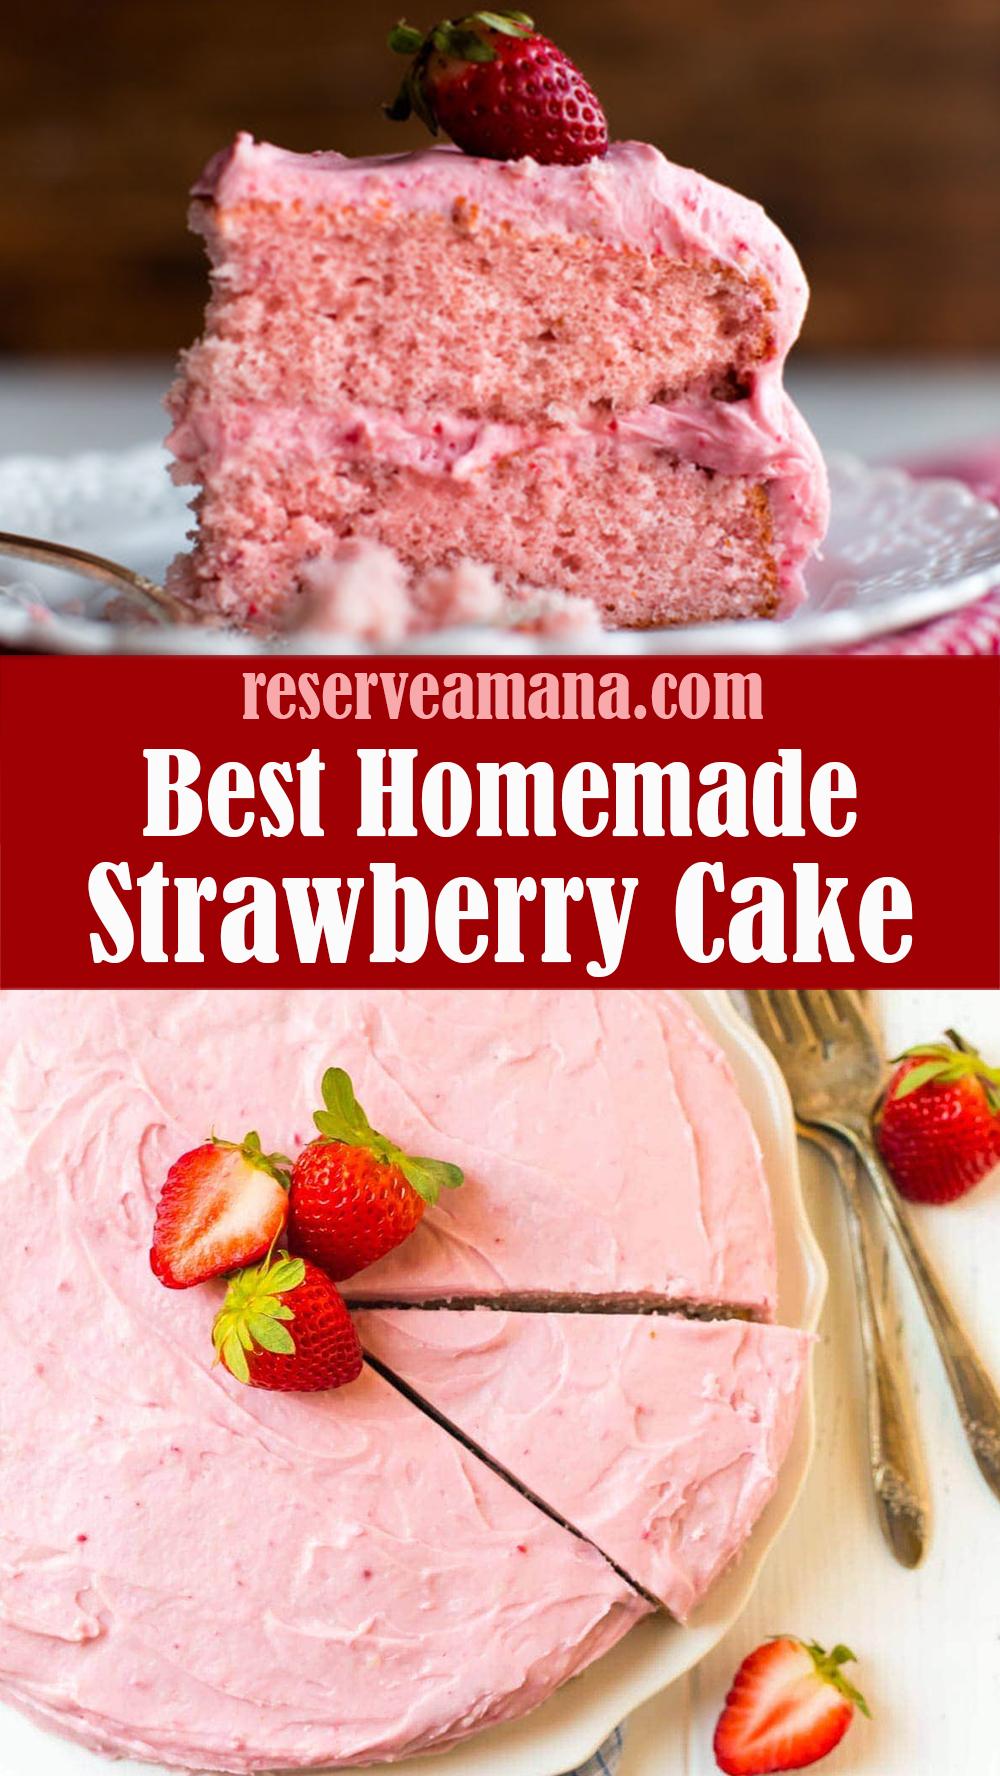 Best Homemade Strawberry Cake